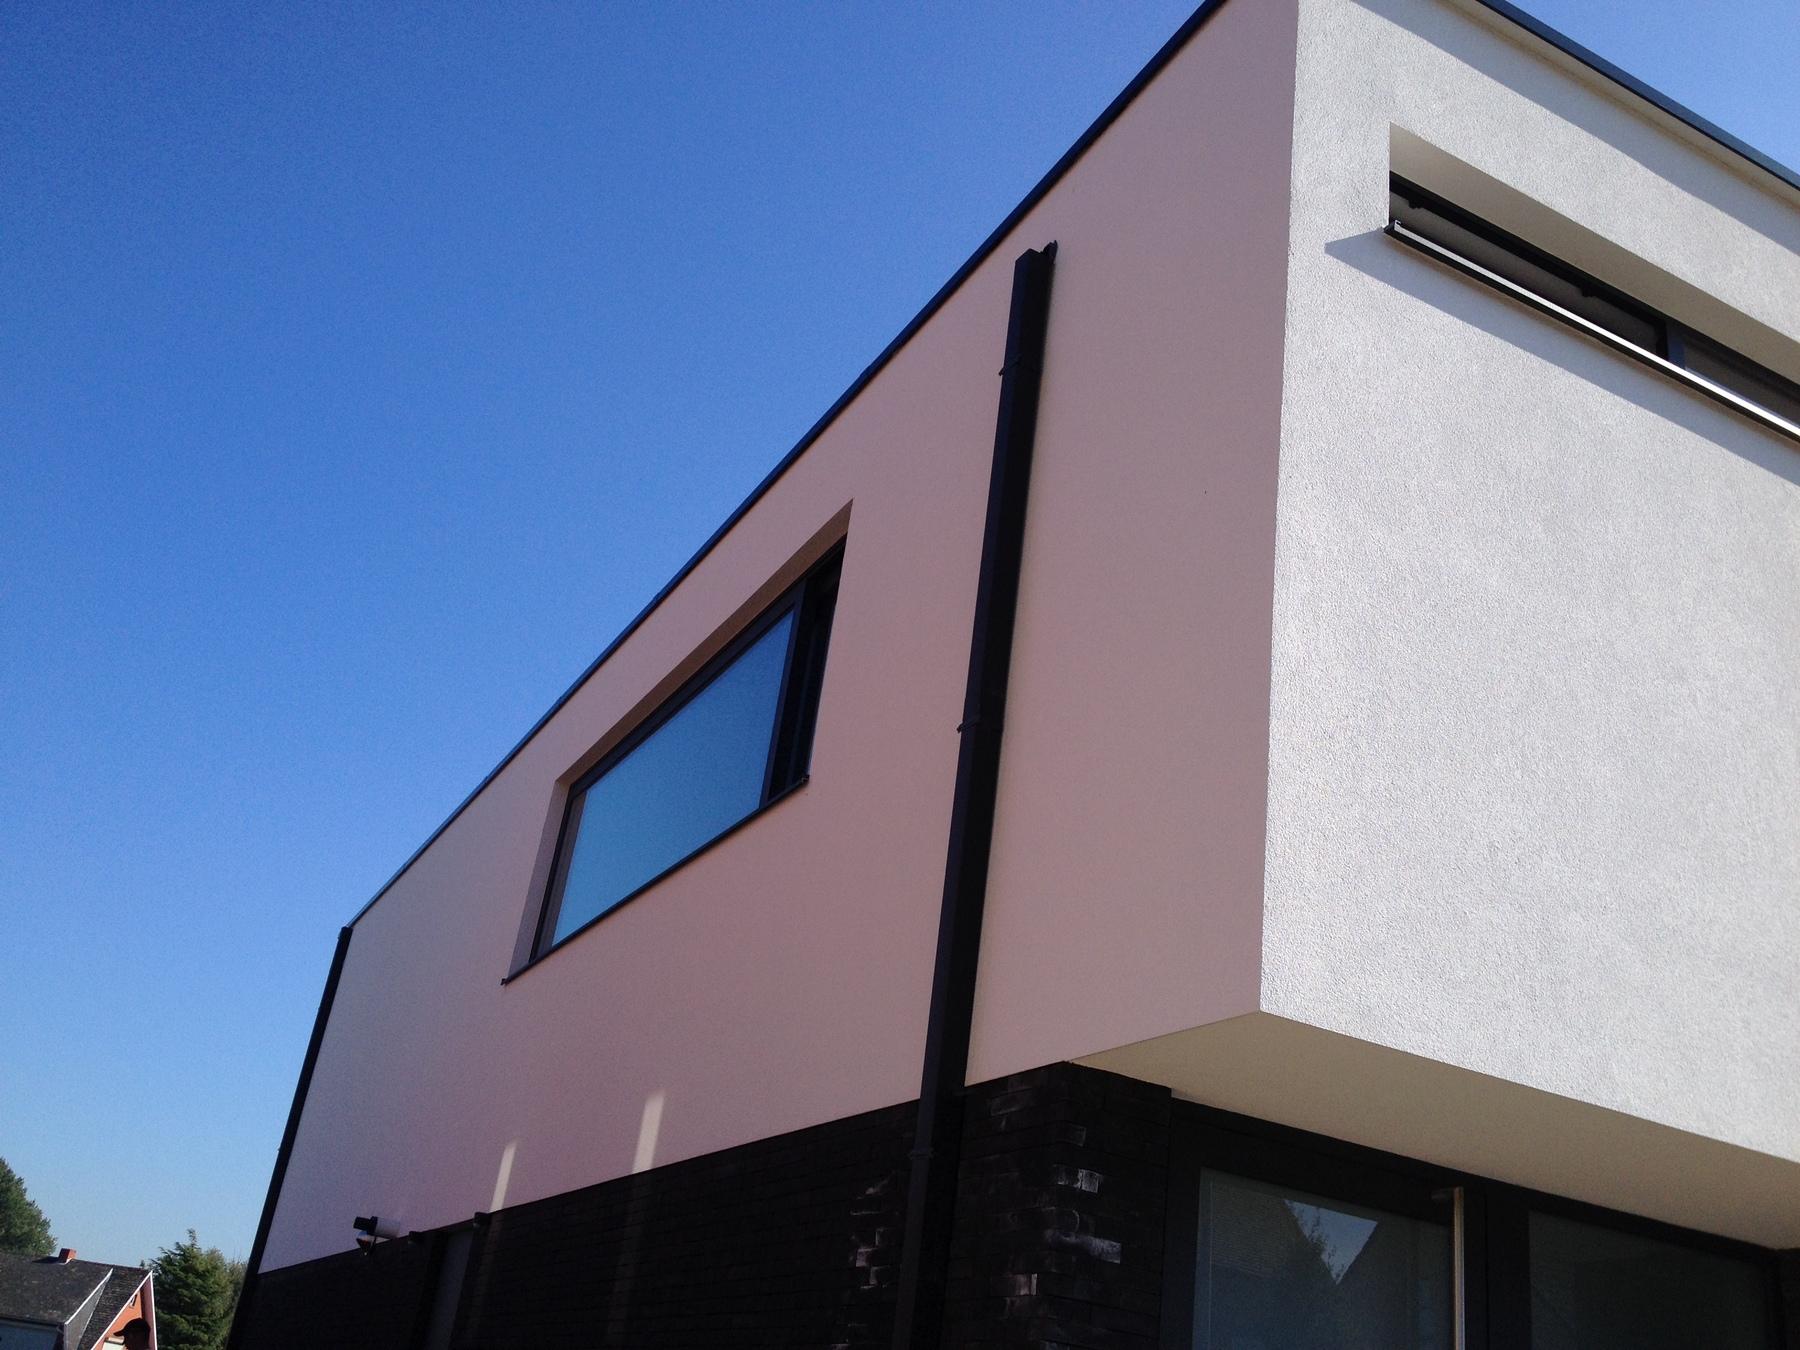 Verbouwing villa lc te minderhout architectuurburo wydouw bvba